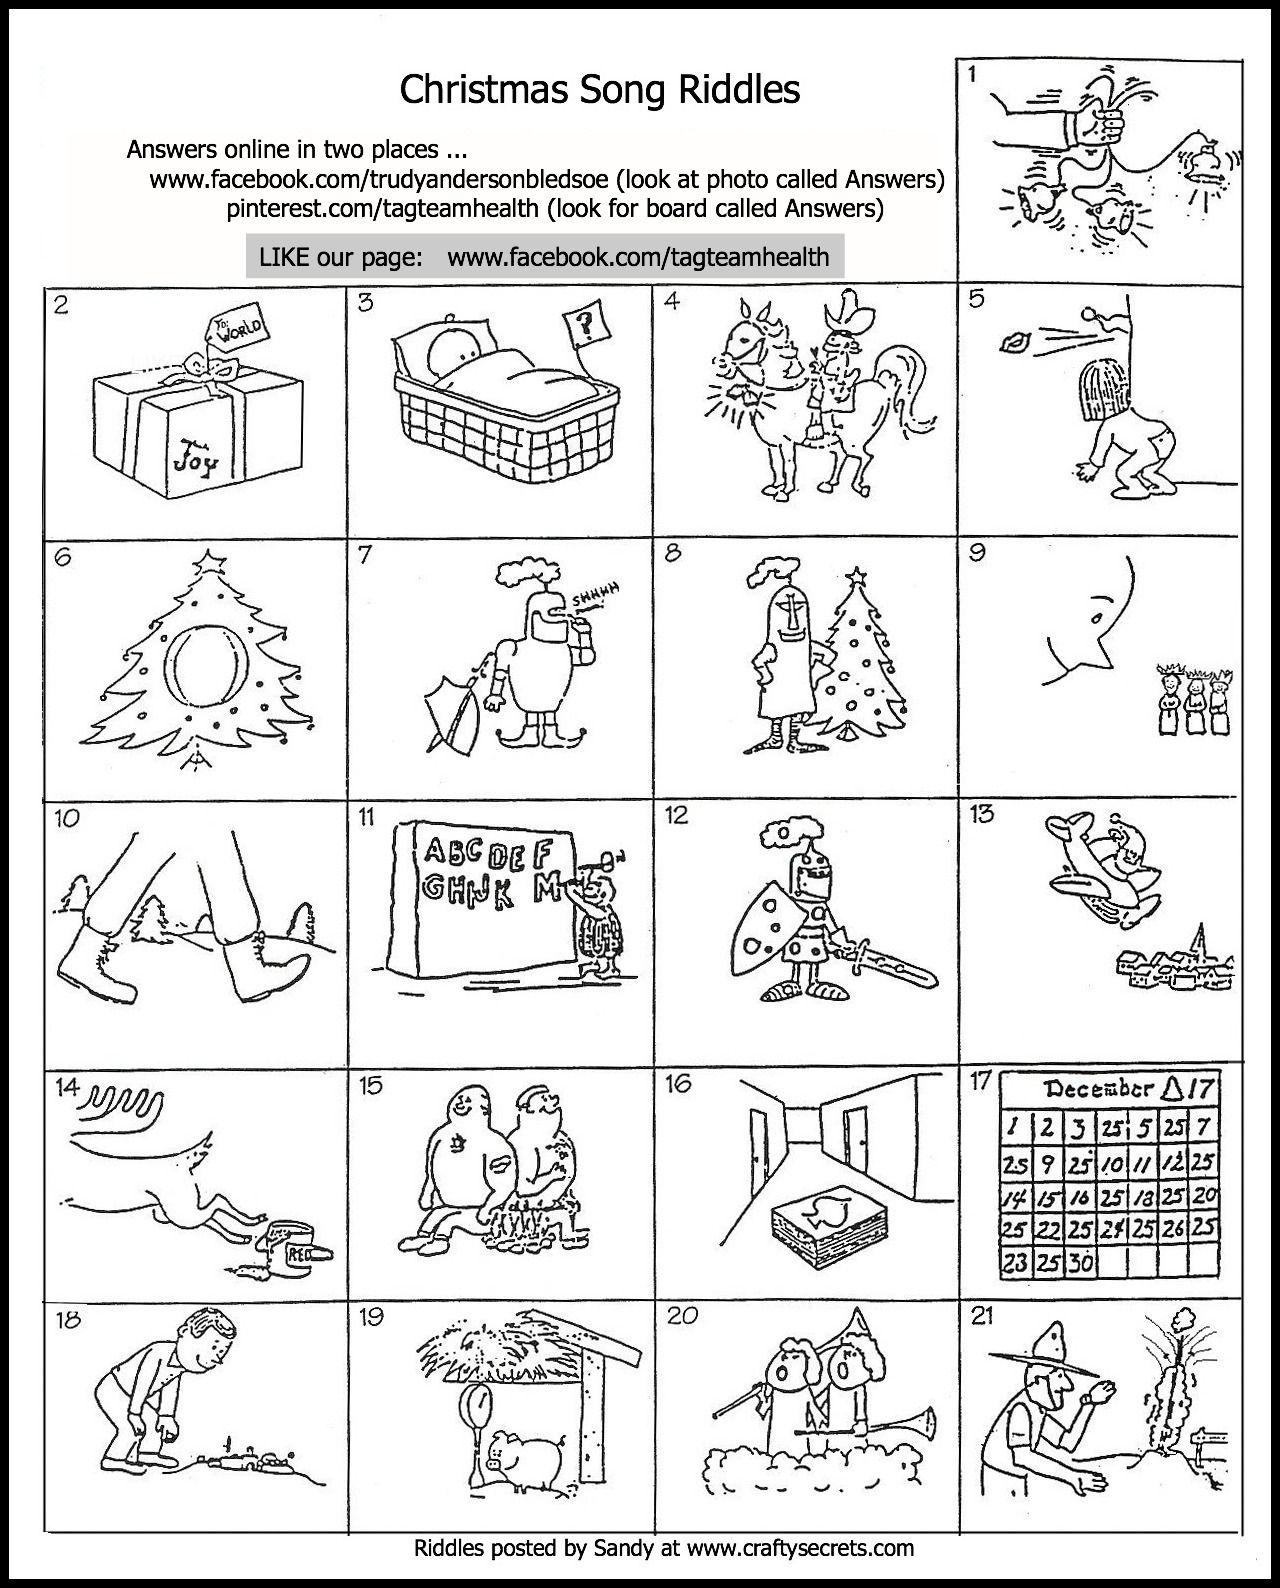 Uncategorized Riddles On Christmas fun christmas song riddles kindergarten riddles